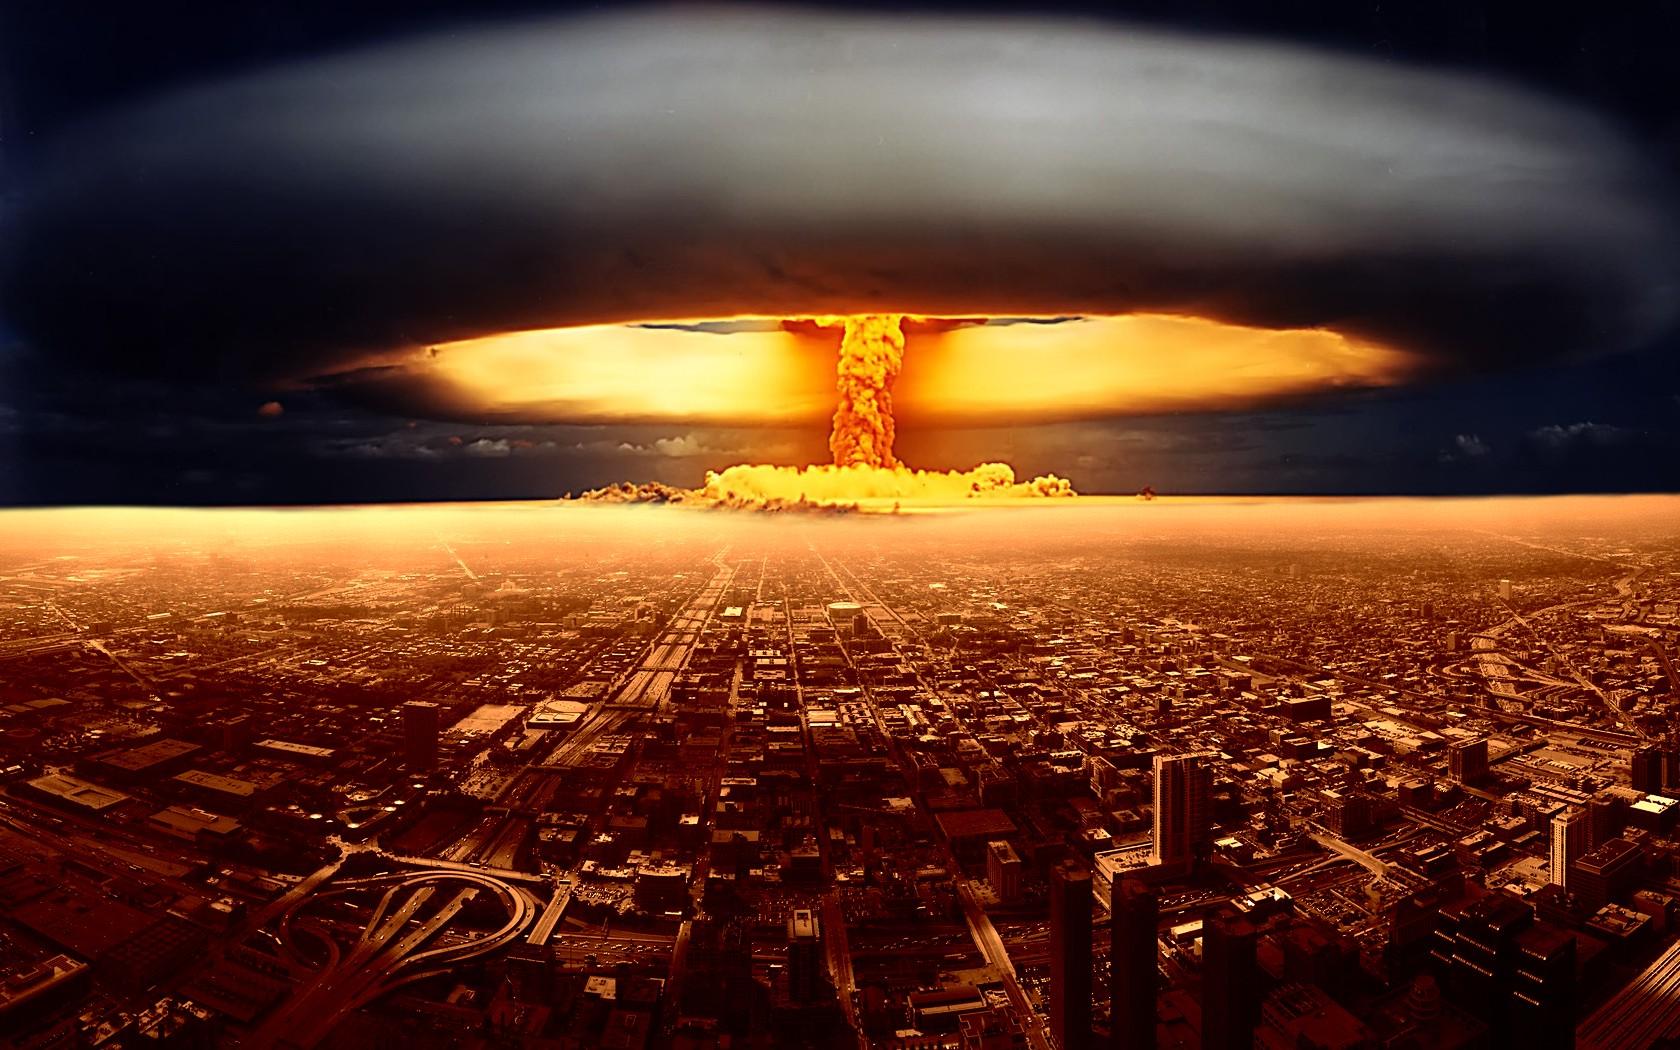 imagen web explosion